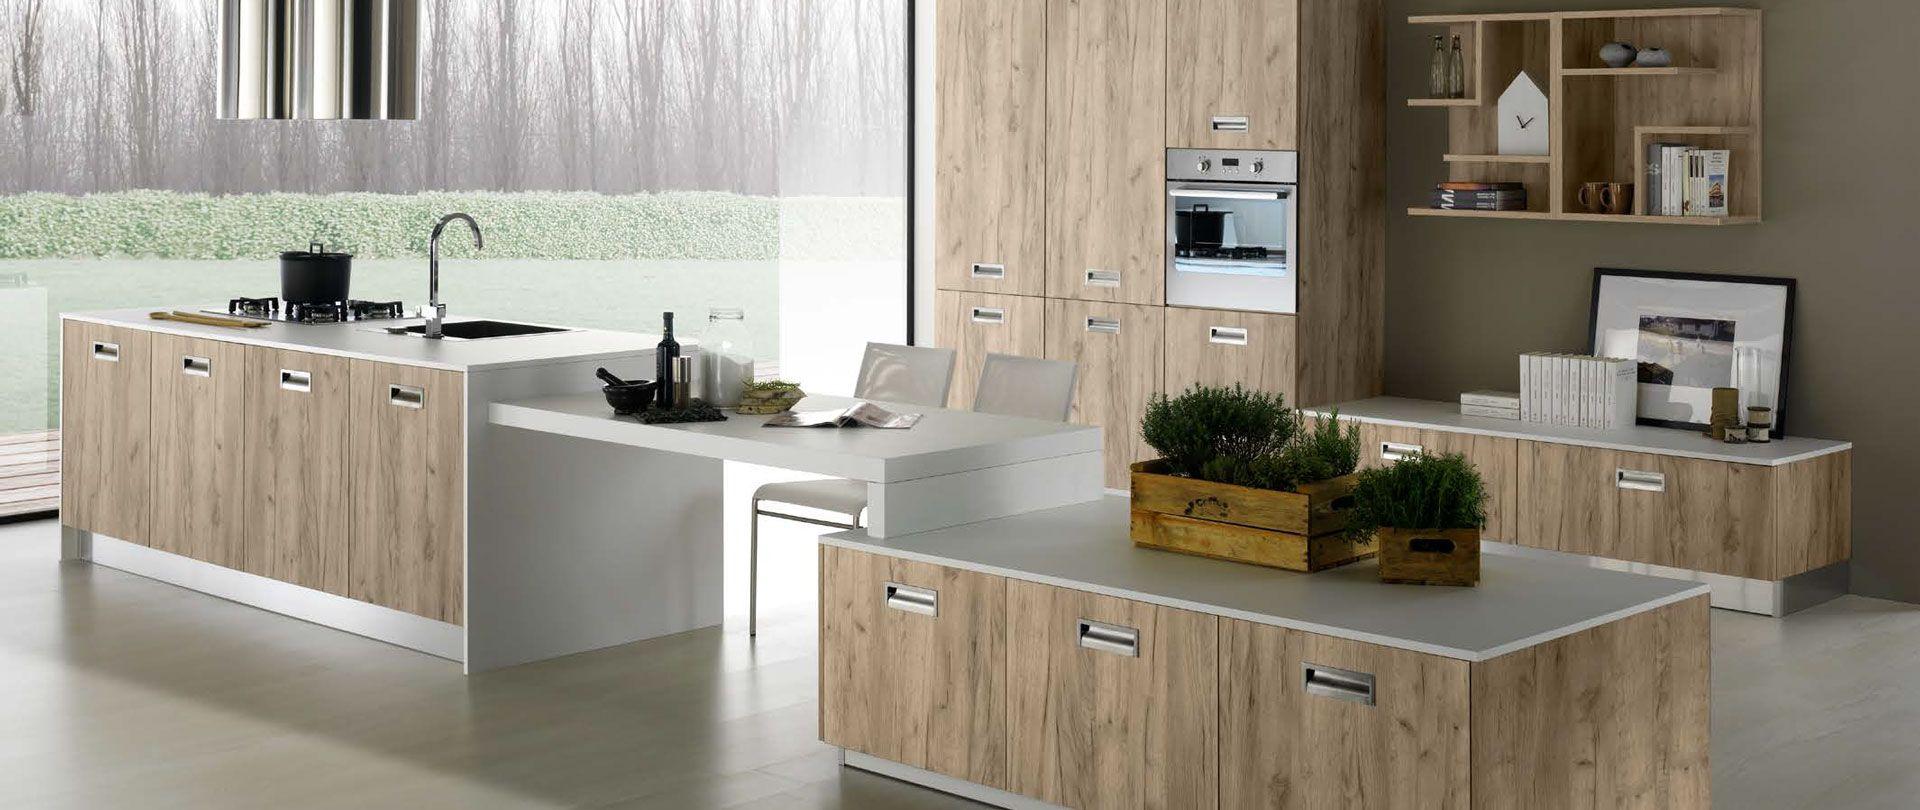 Atemberaubende Nevada Moderne Küche Lförmigen die